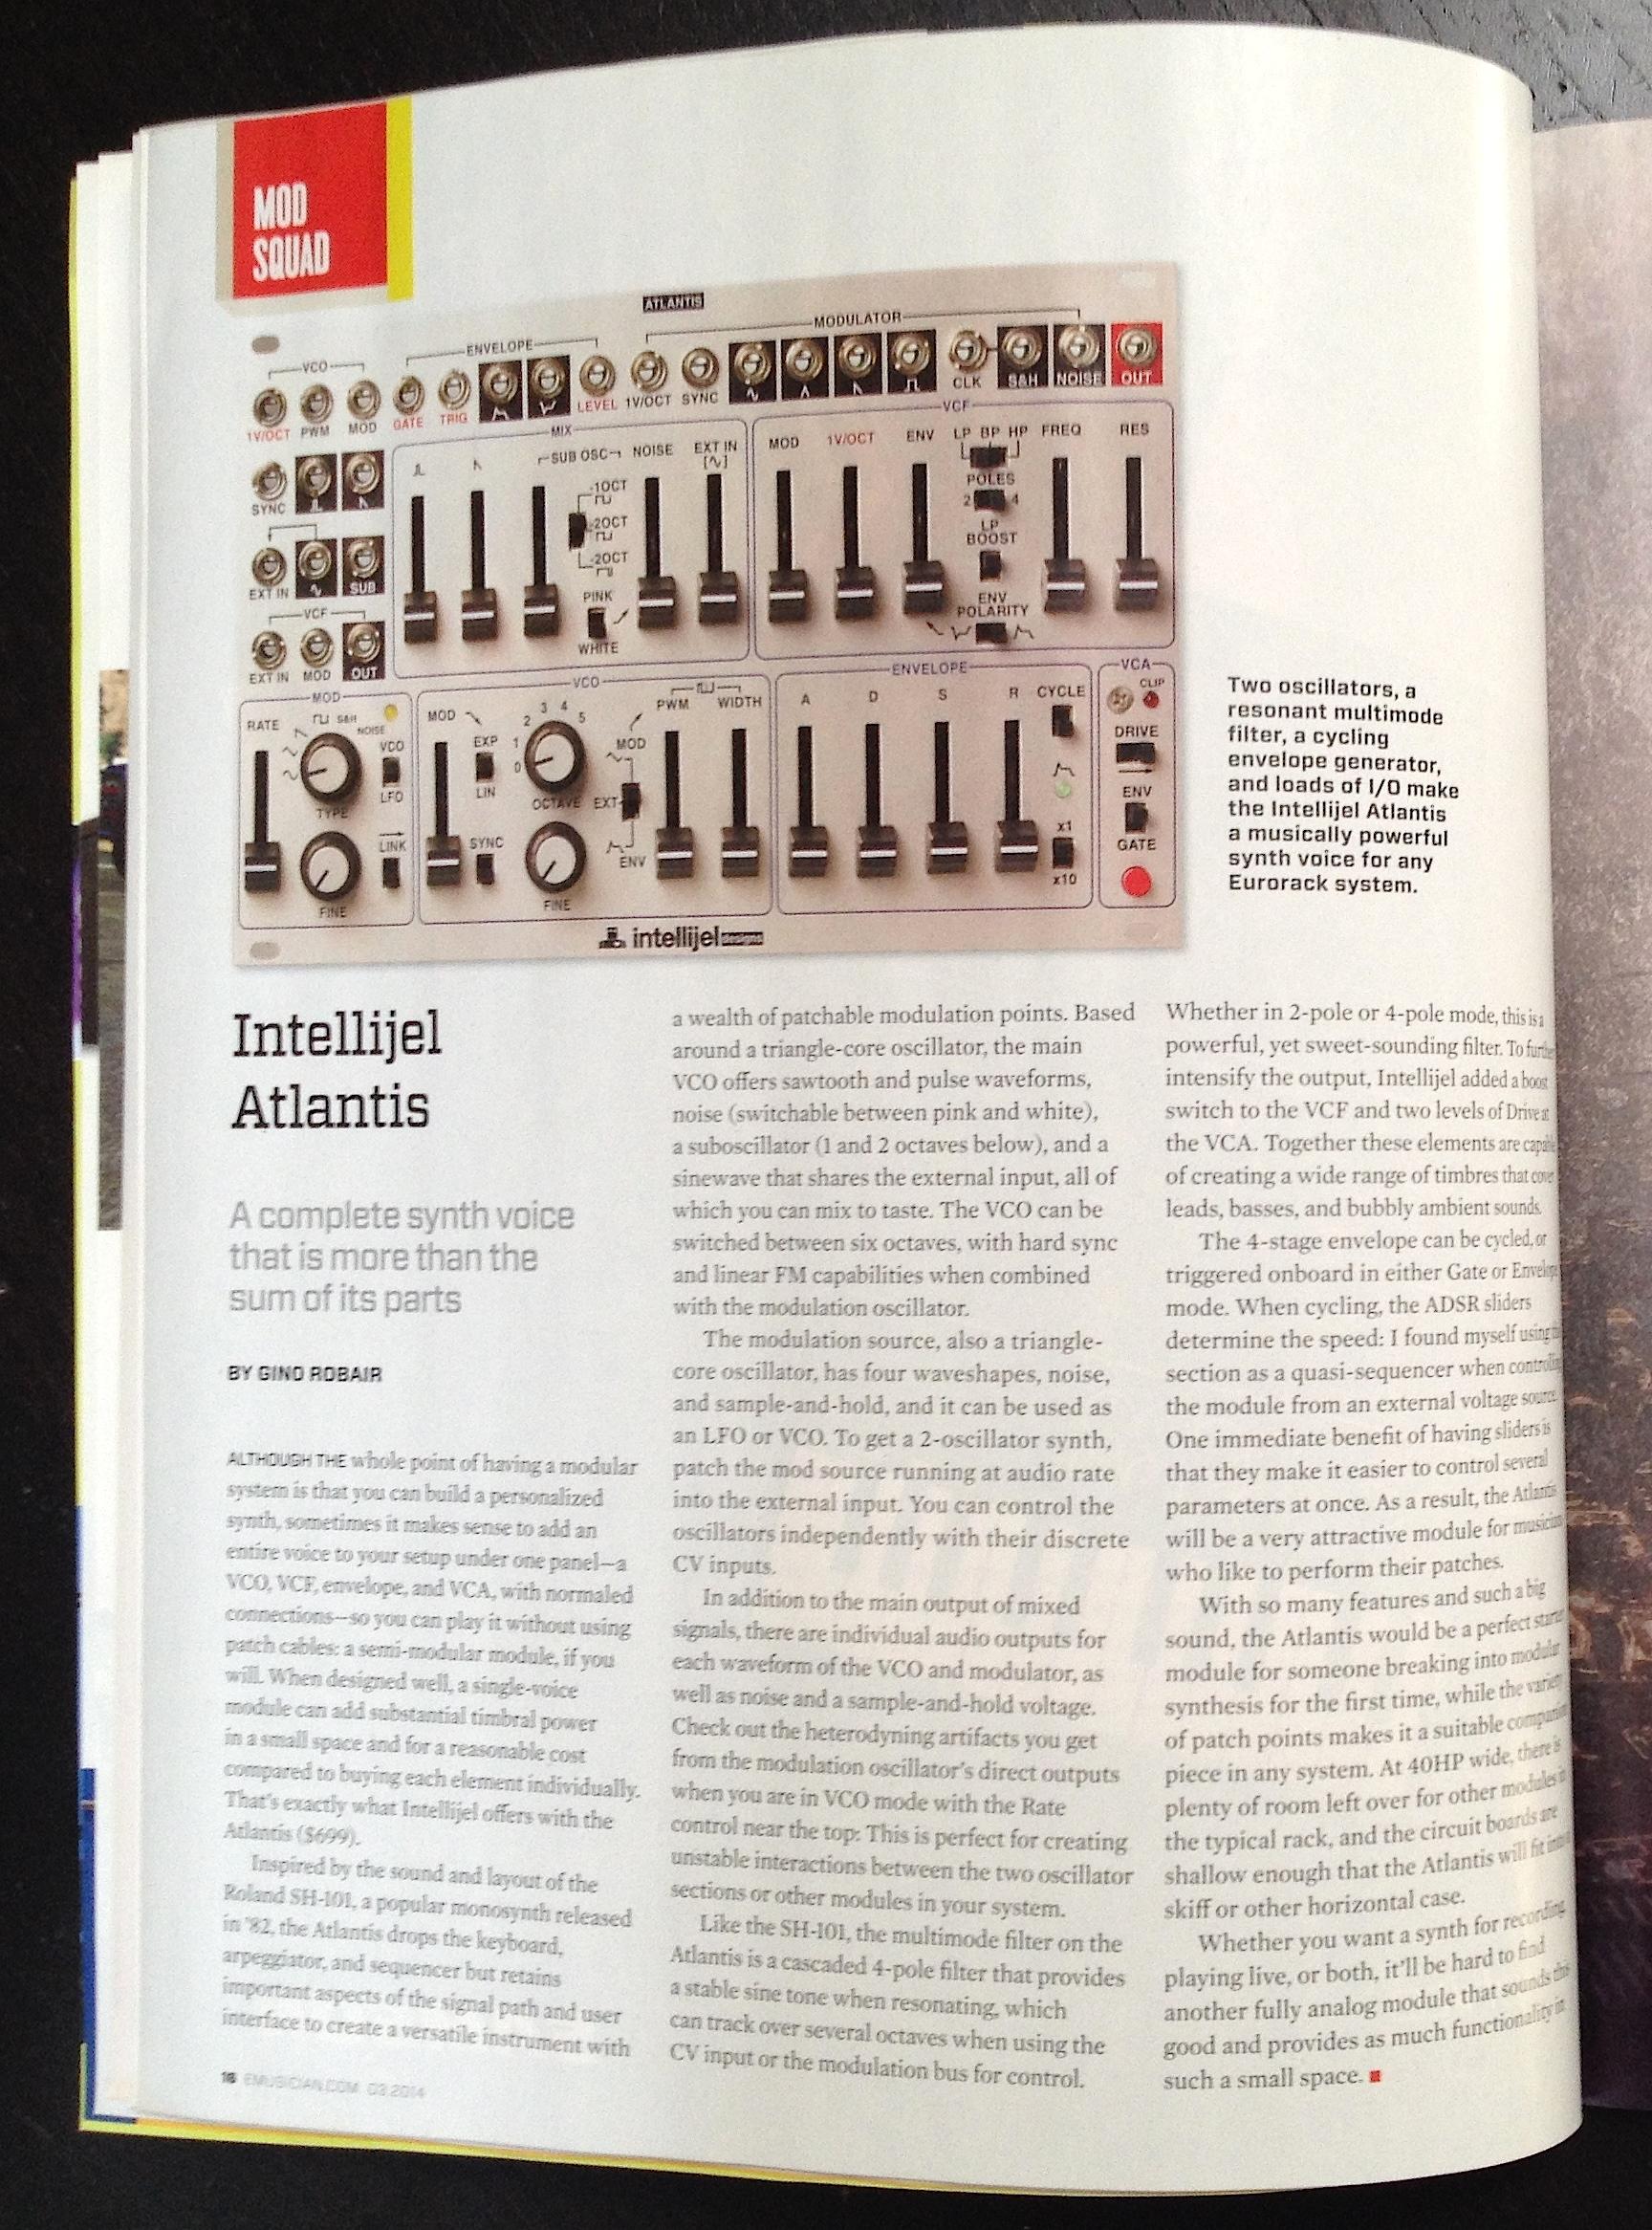 EM March 2014 Mod Squad Atlantis review